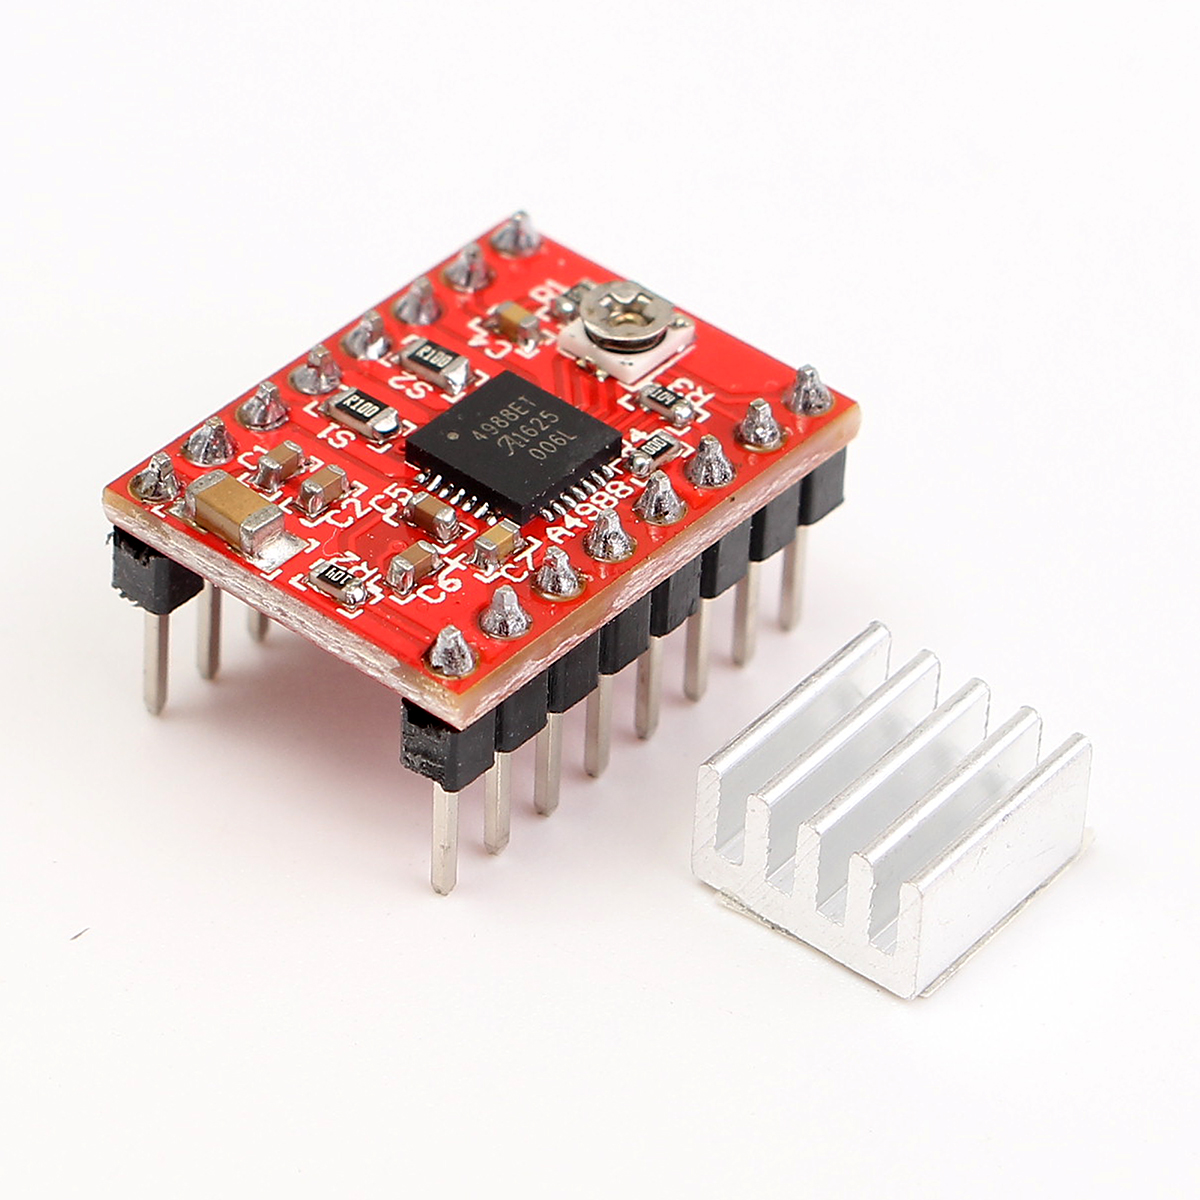 5pcs A4988 StepStick Stepper Driver + Heat sink For Reprap 3D Printer Parts Red Stepper Motor Driver